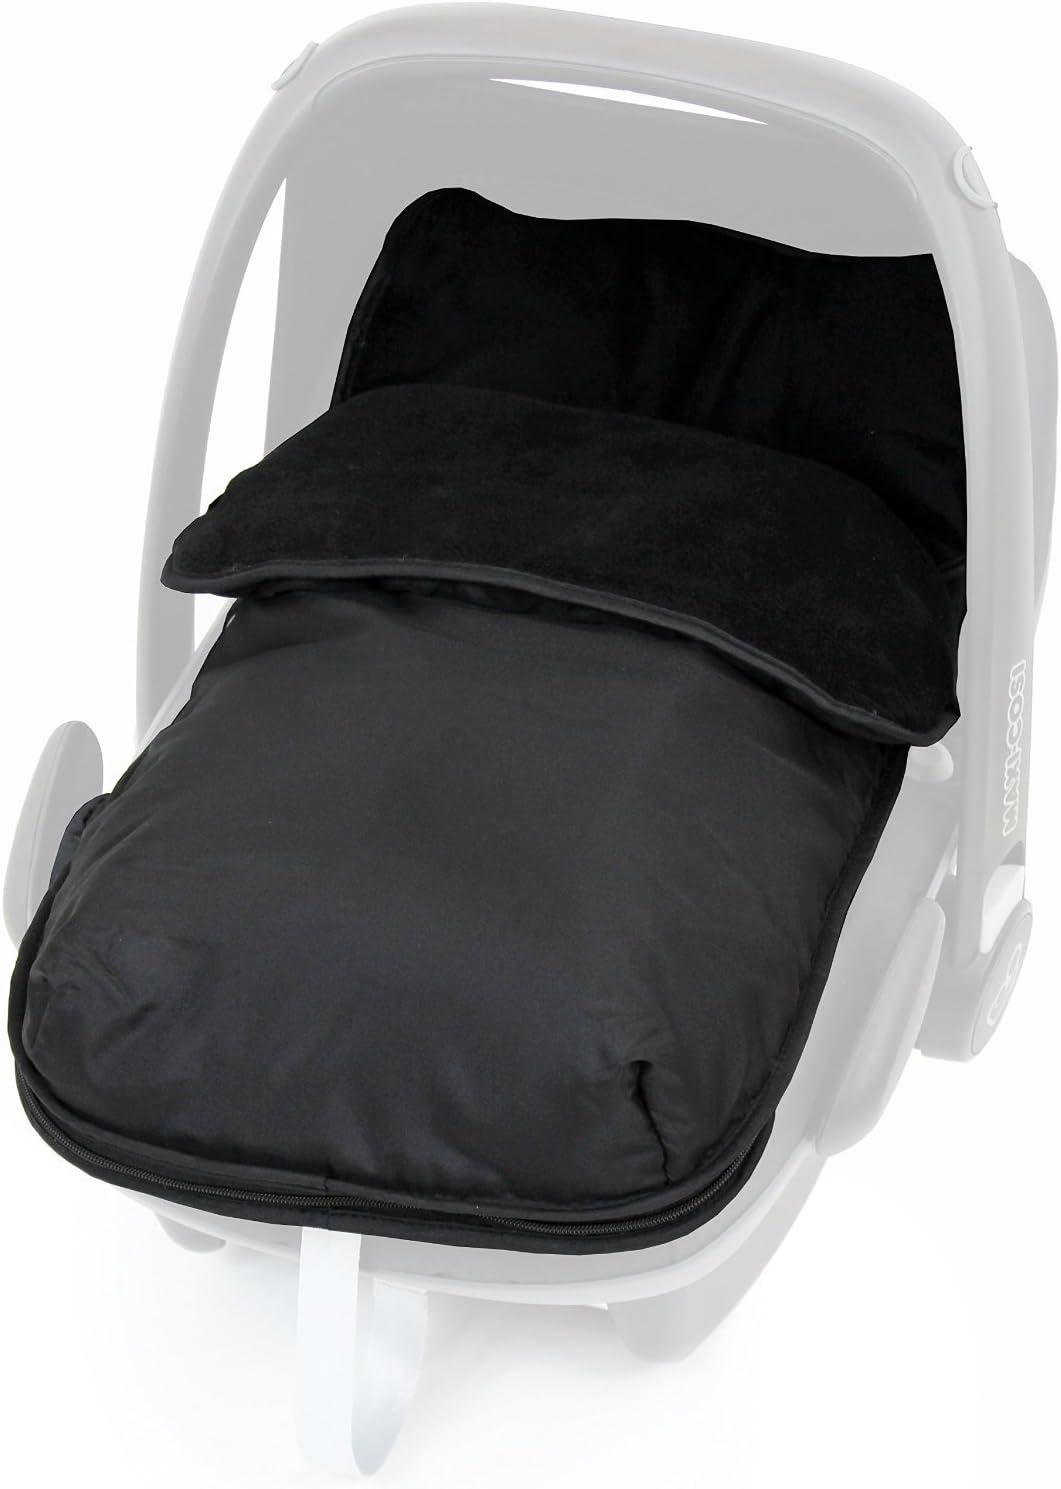 Grey Universal Car Seat Footmuff to Fit Silver Cross Black//Grey